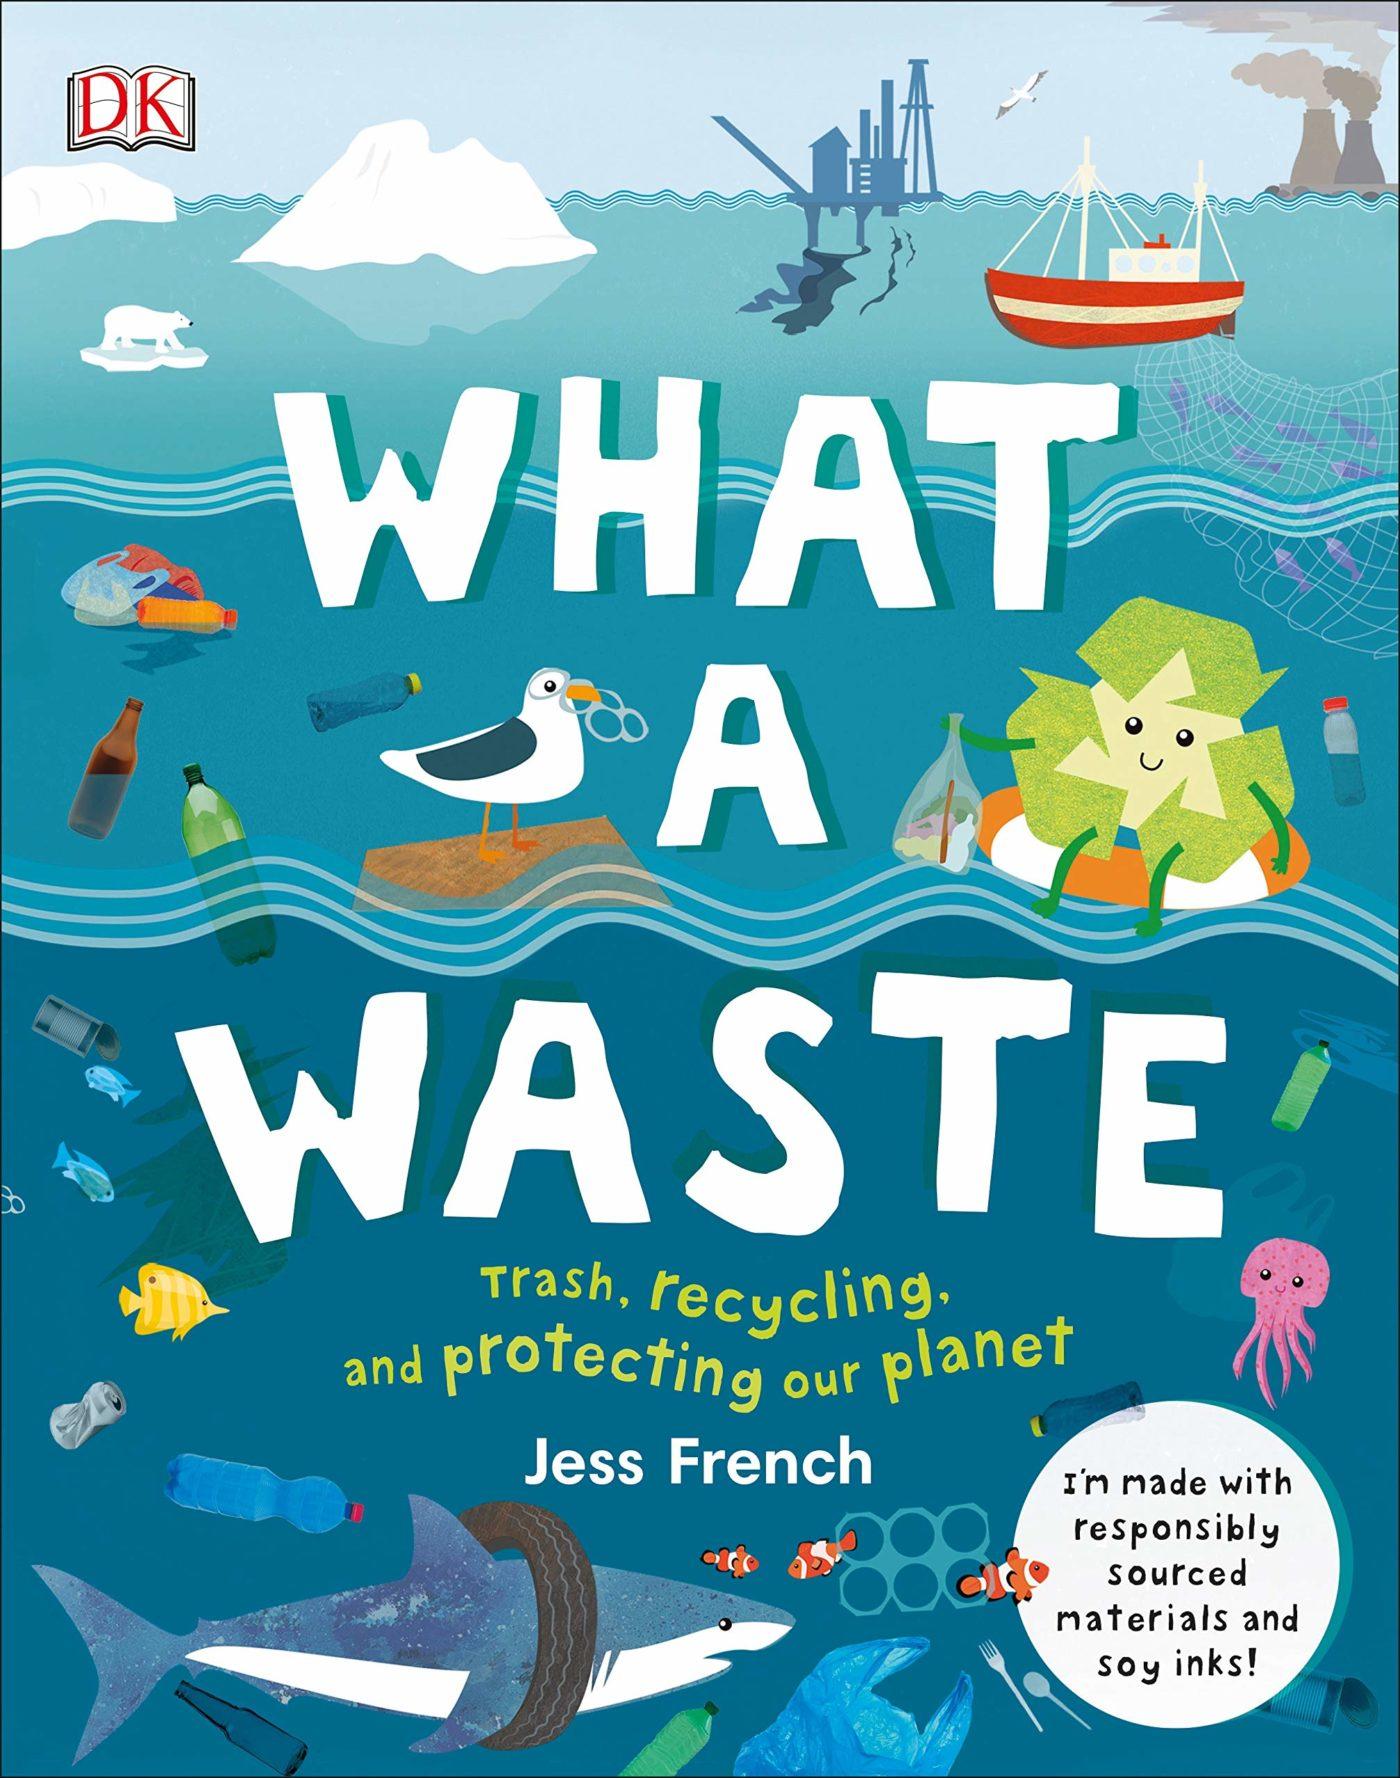 Educational Plastics Books For Kids